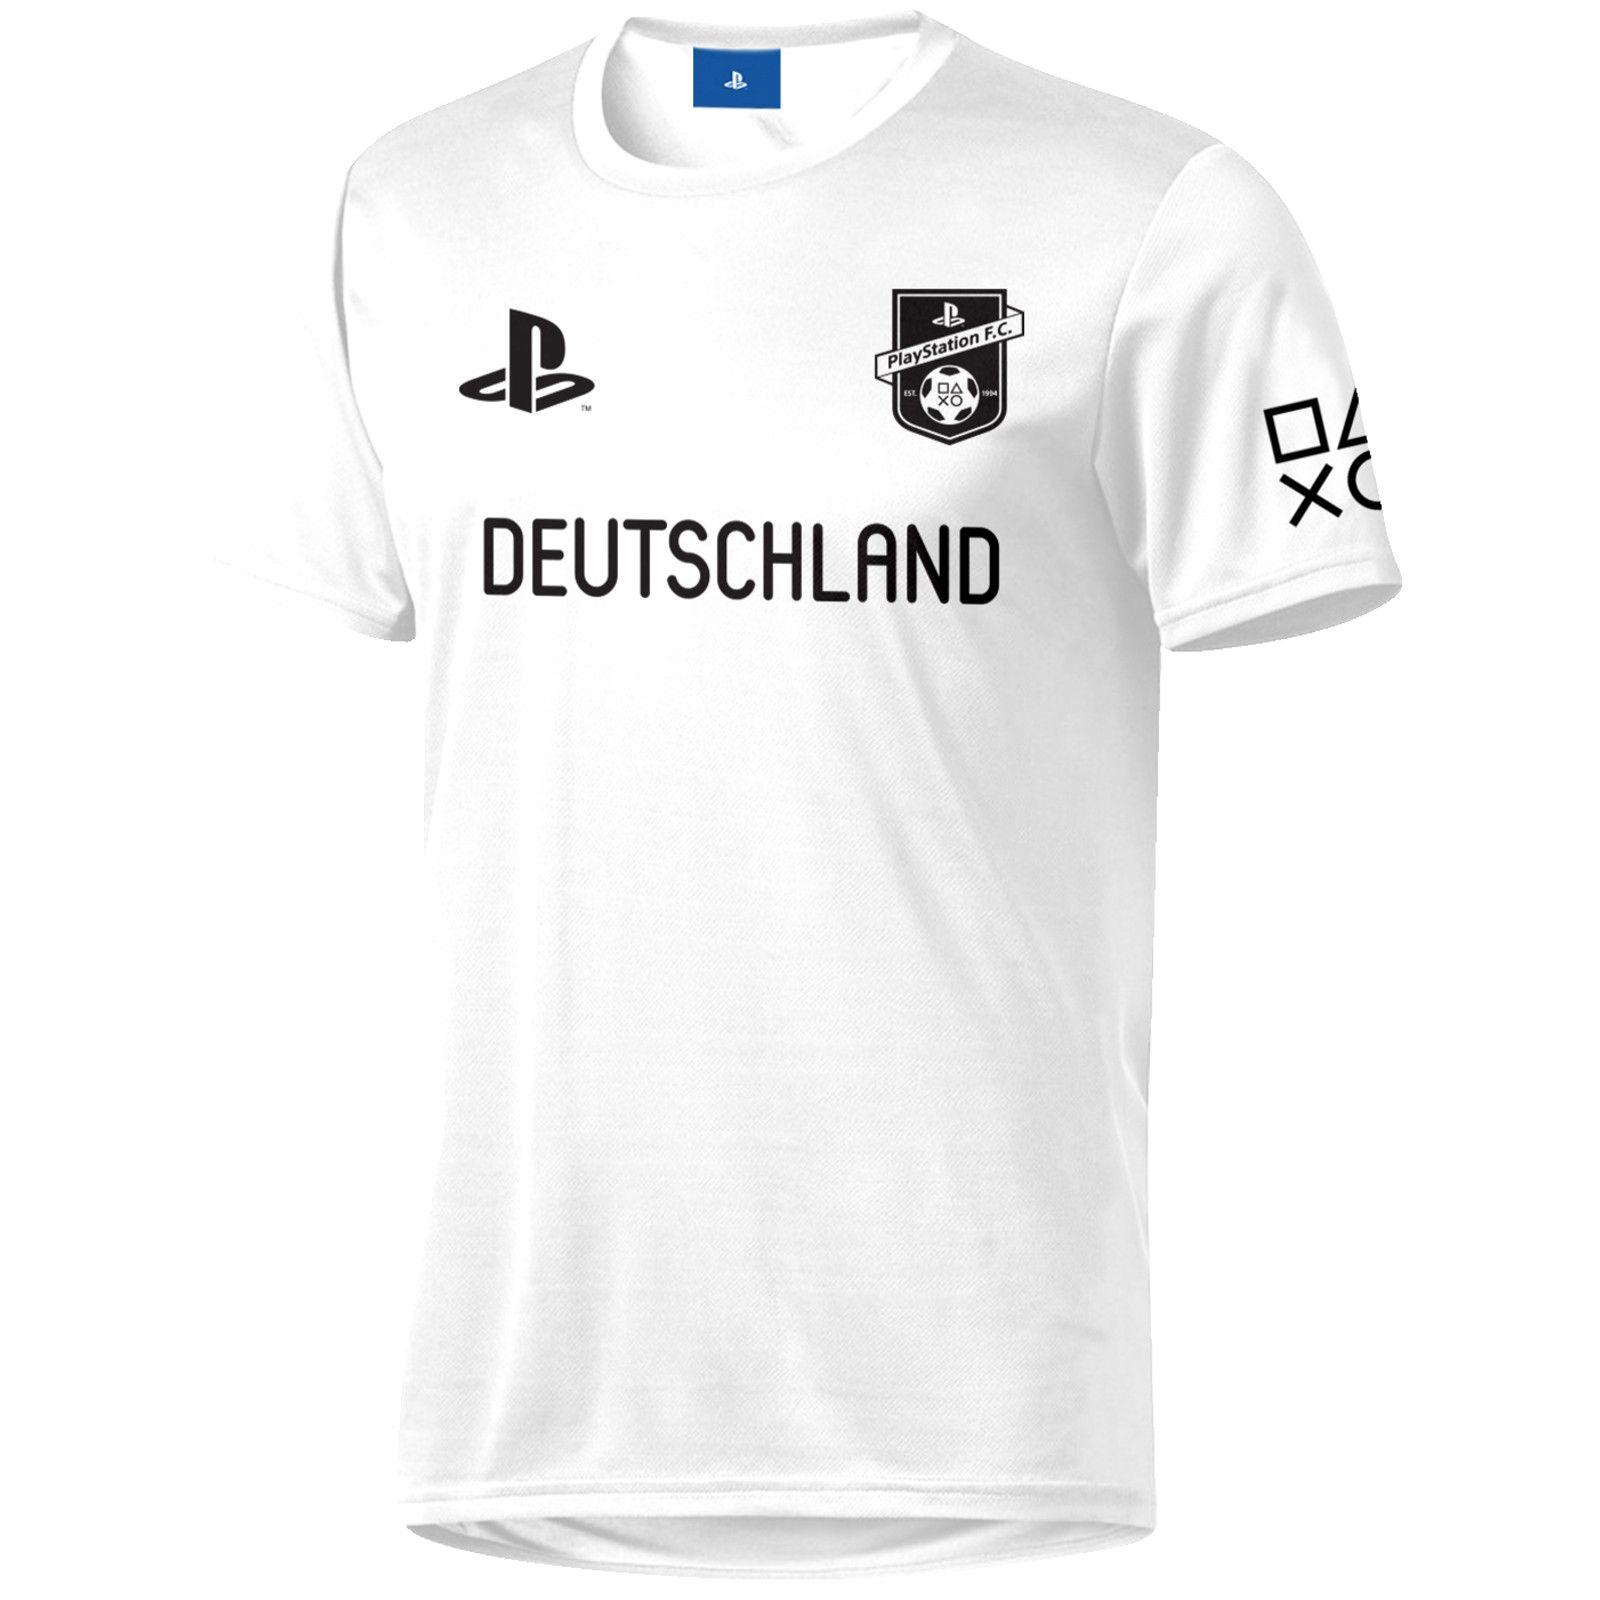 Lokal: Saturn Potsdam - Playstation FC Trikot 2€